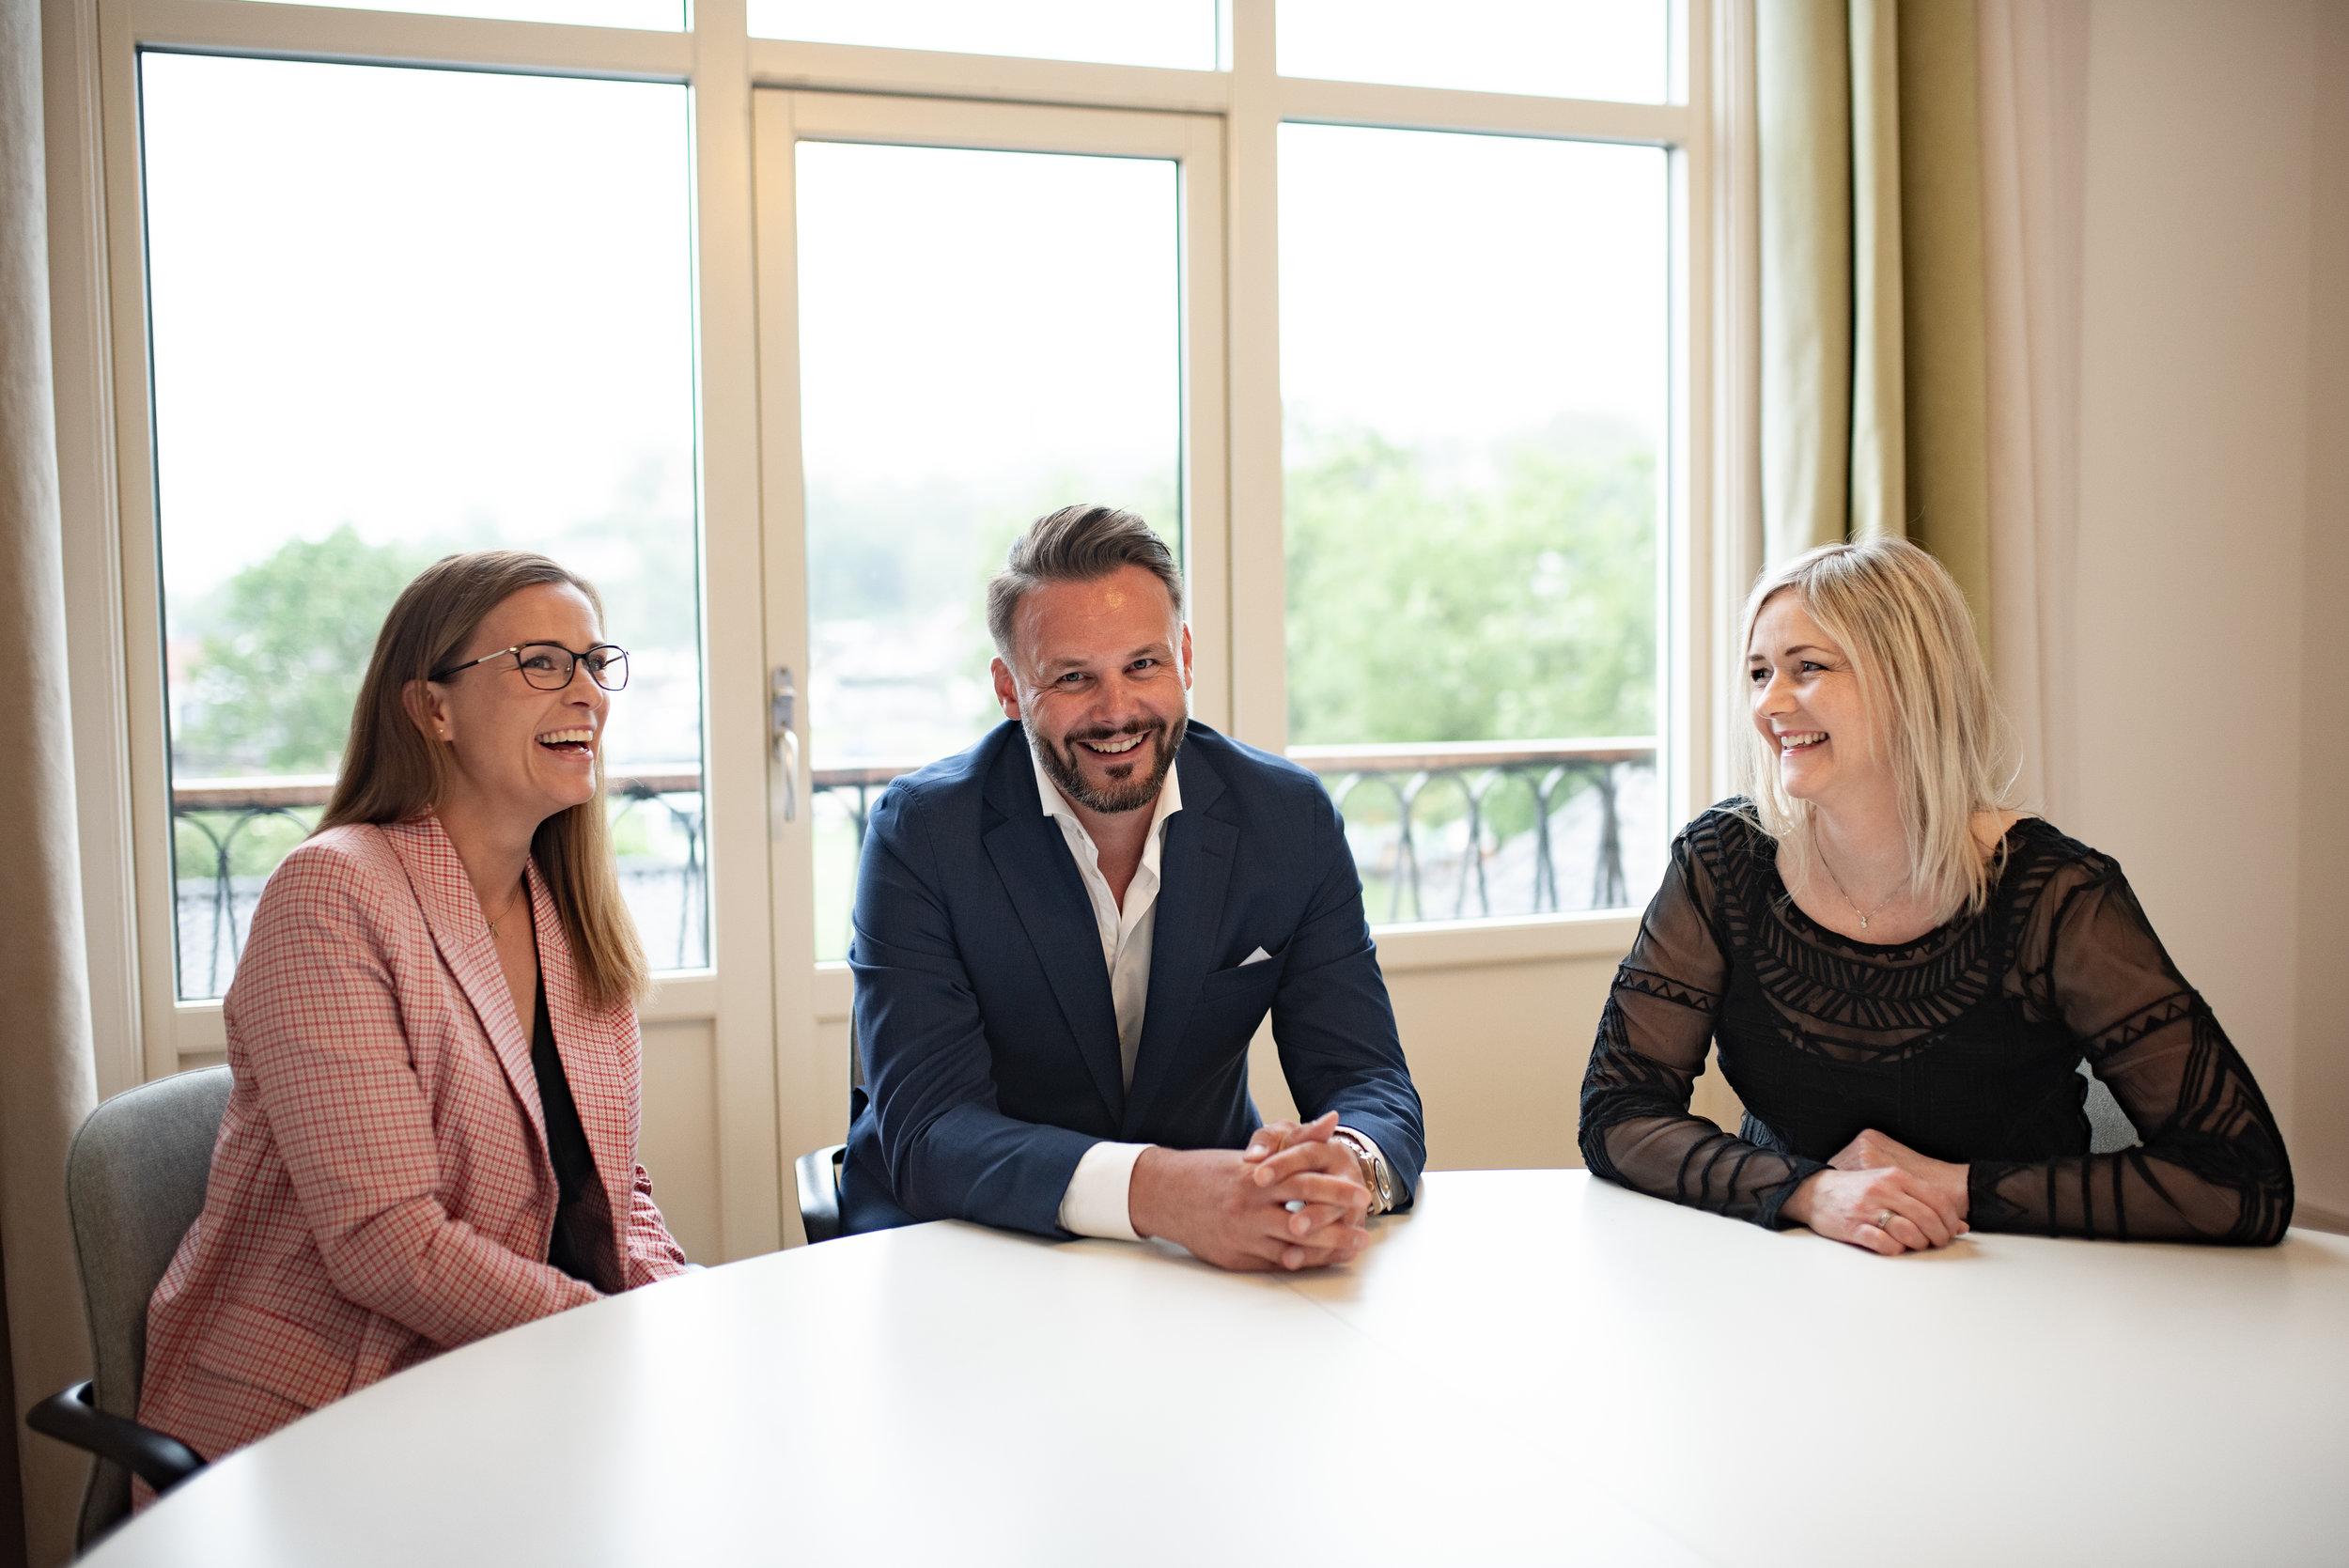 Stine Meltevik, assisterende direktør, Rune Stiberg-Jamt, administrerende direktør, og Elisabet Sørfjorddal Hauge, sjefsanalytiker.